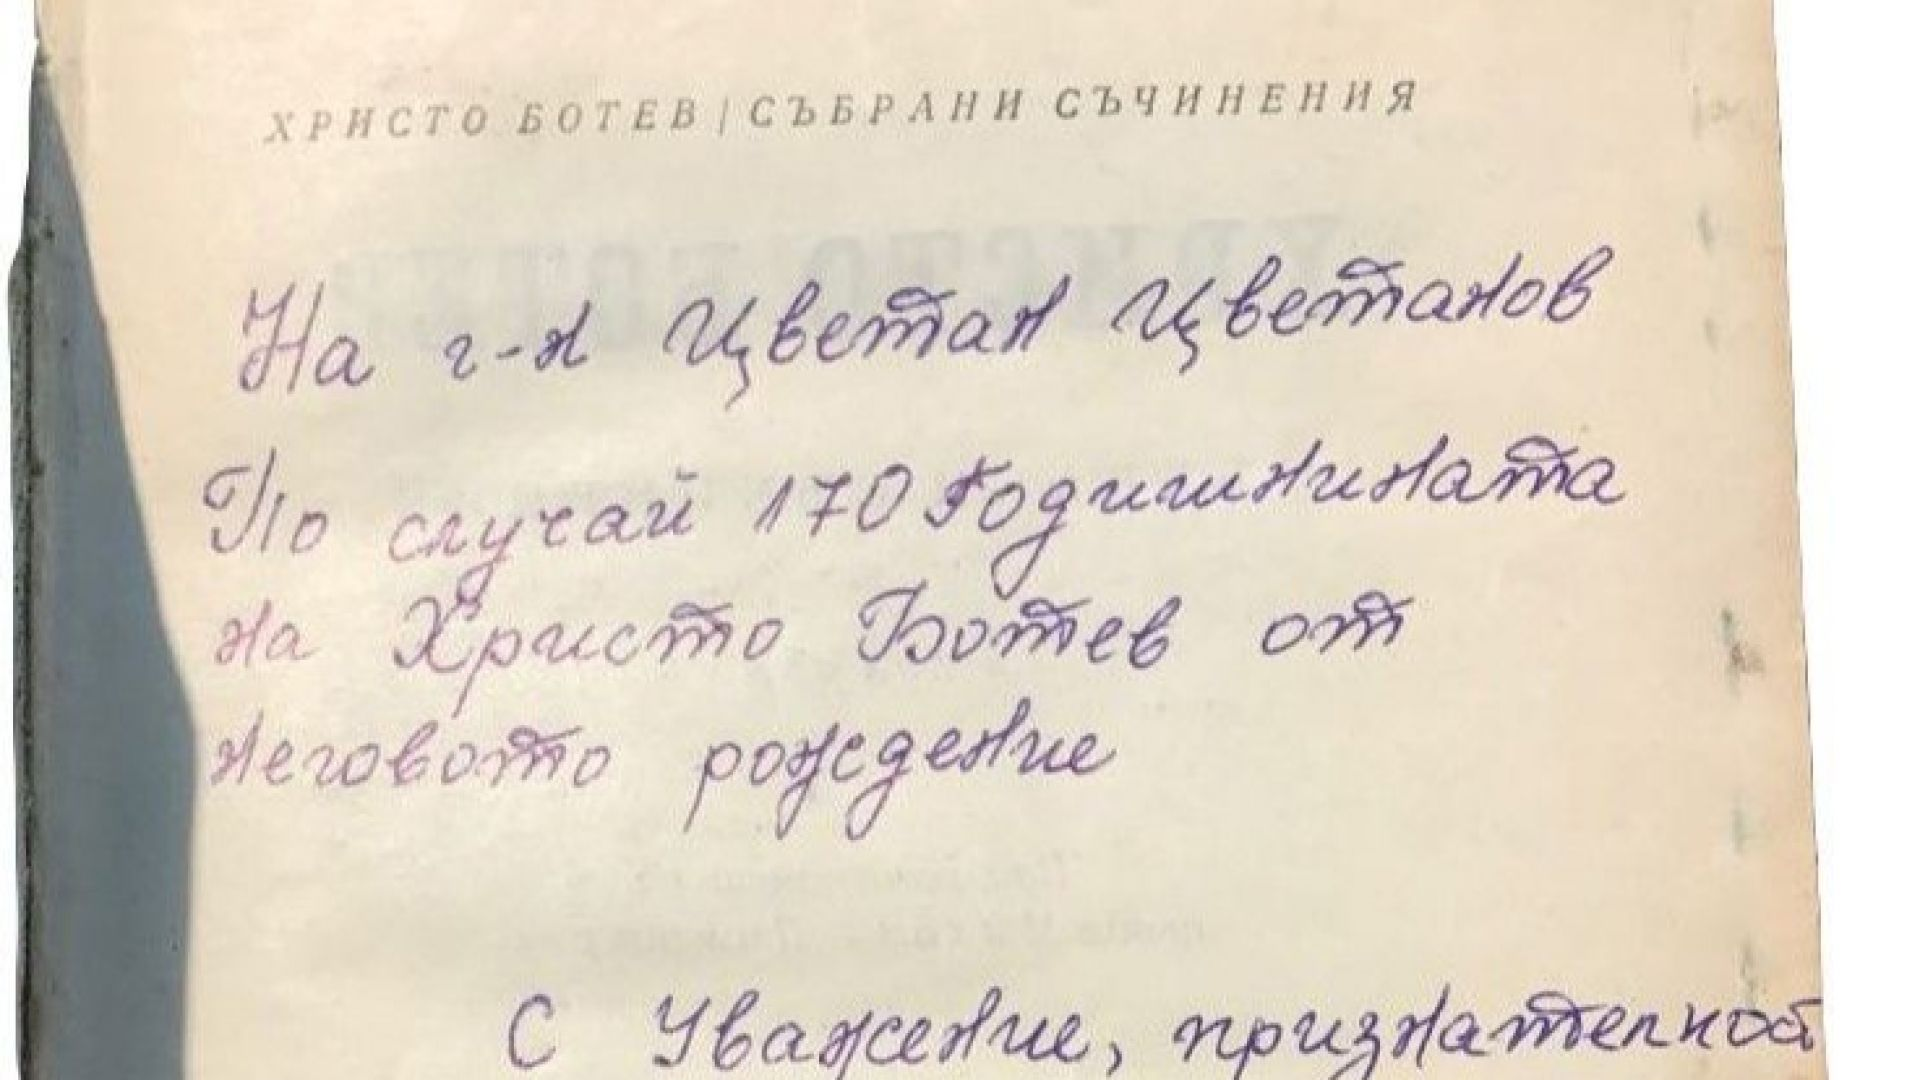 Посвещението от правнука на Ботев, посветено на Цветанов